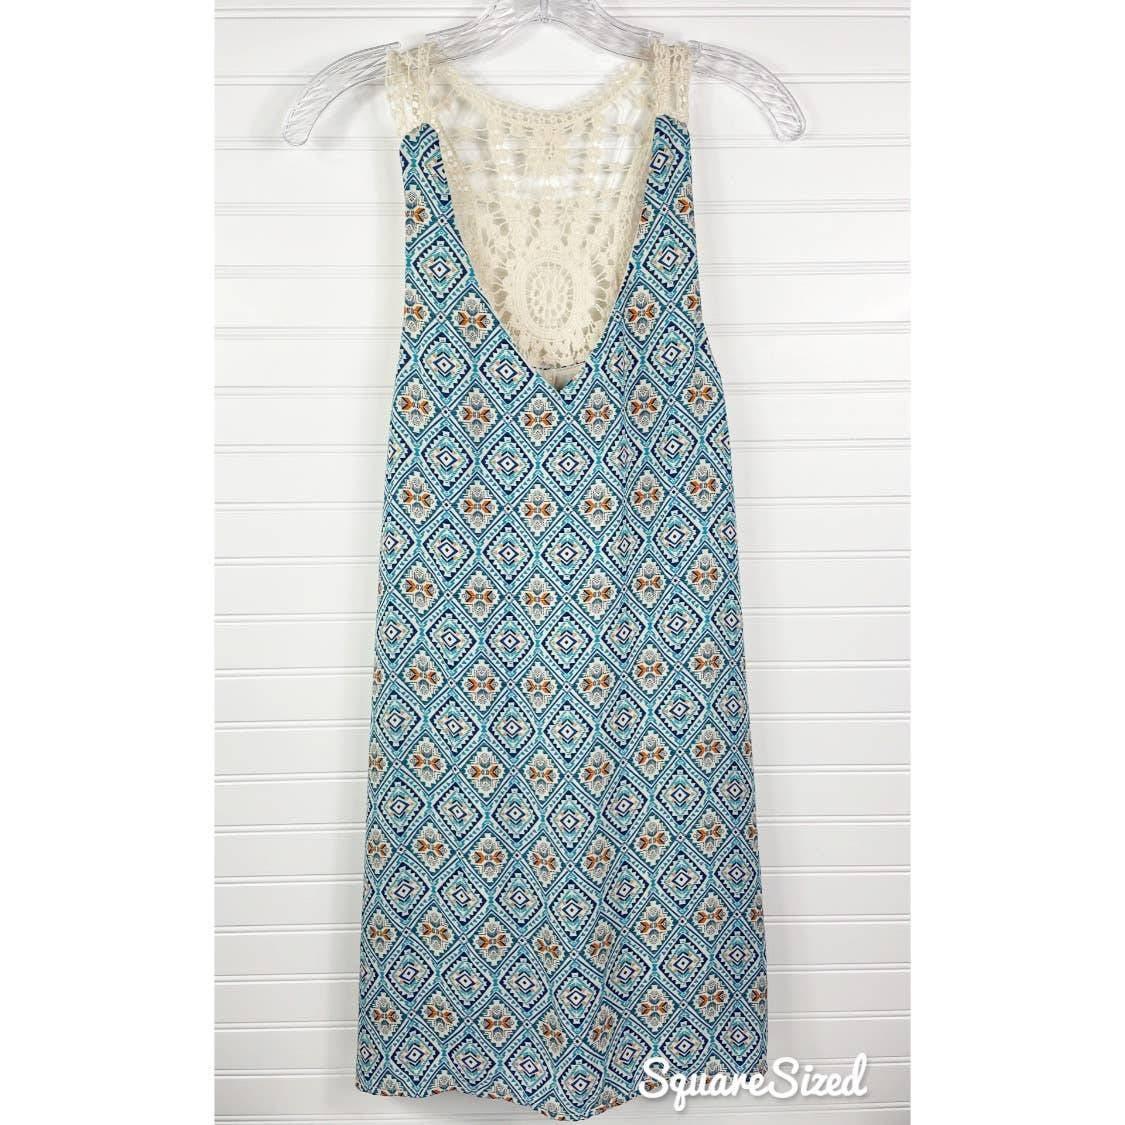 NWT As You Wish Aztec Lace Tank Dress